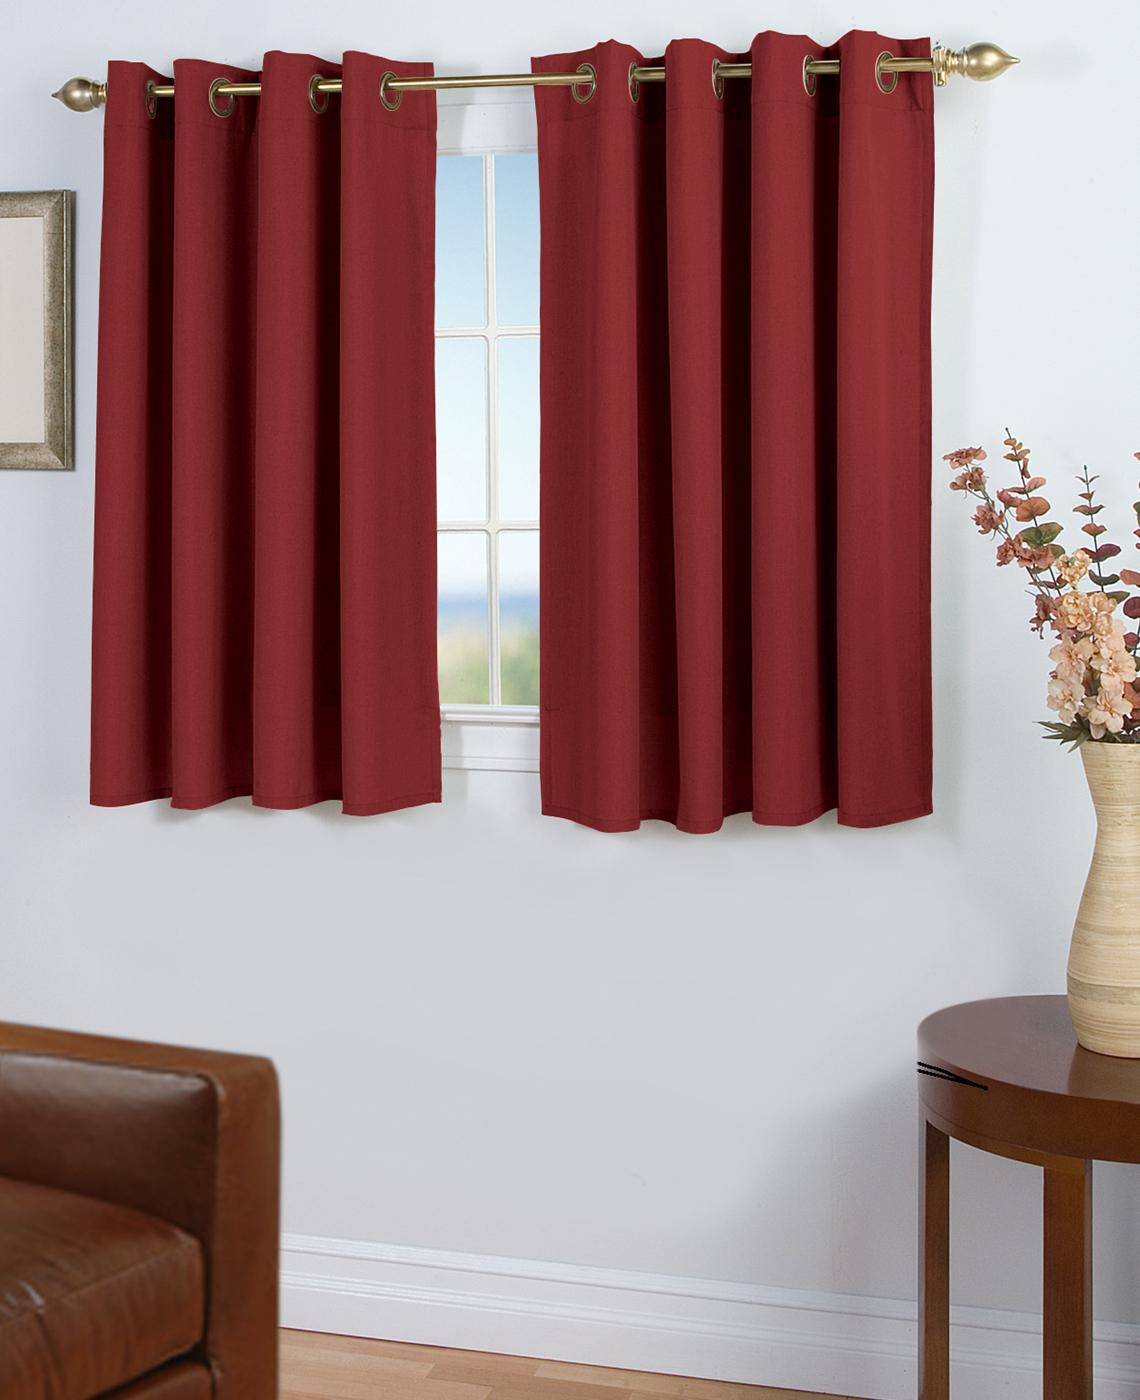 45-Inch Long Curtains - Thecurtainshop regarding Ultimate Blackout Short Length Grommet Panels (Image 2 of 30)